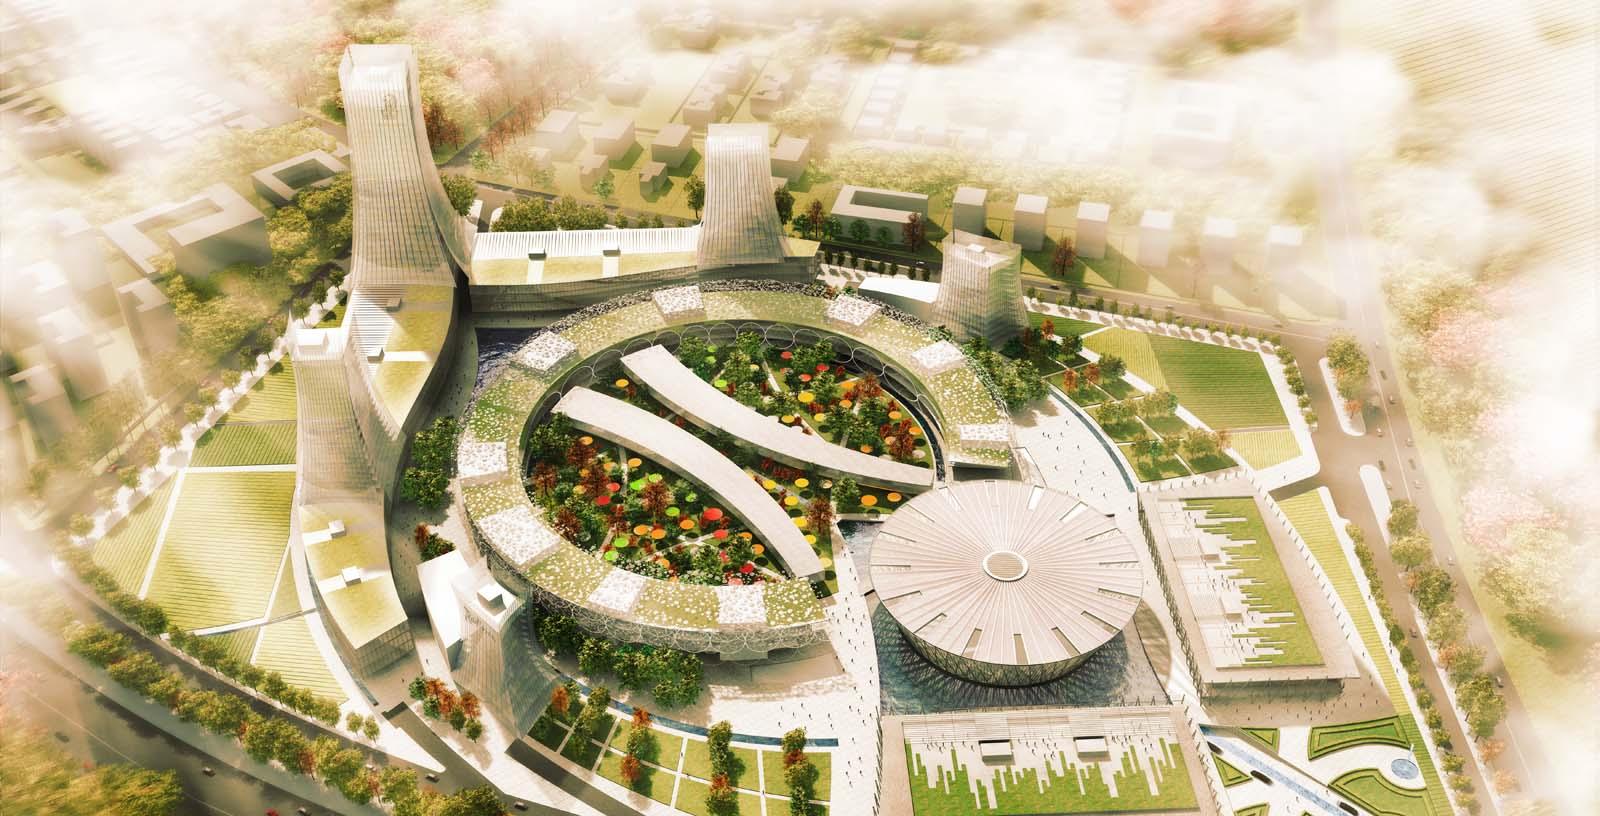 Mohali_Convention_Centre_01_Architecture_Idom_computer_graphic_GLT